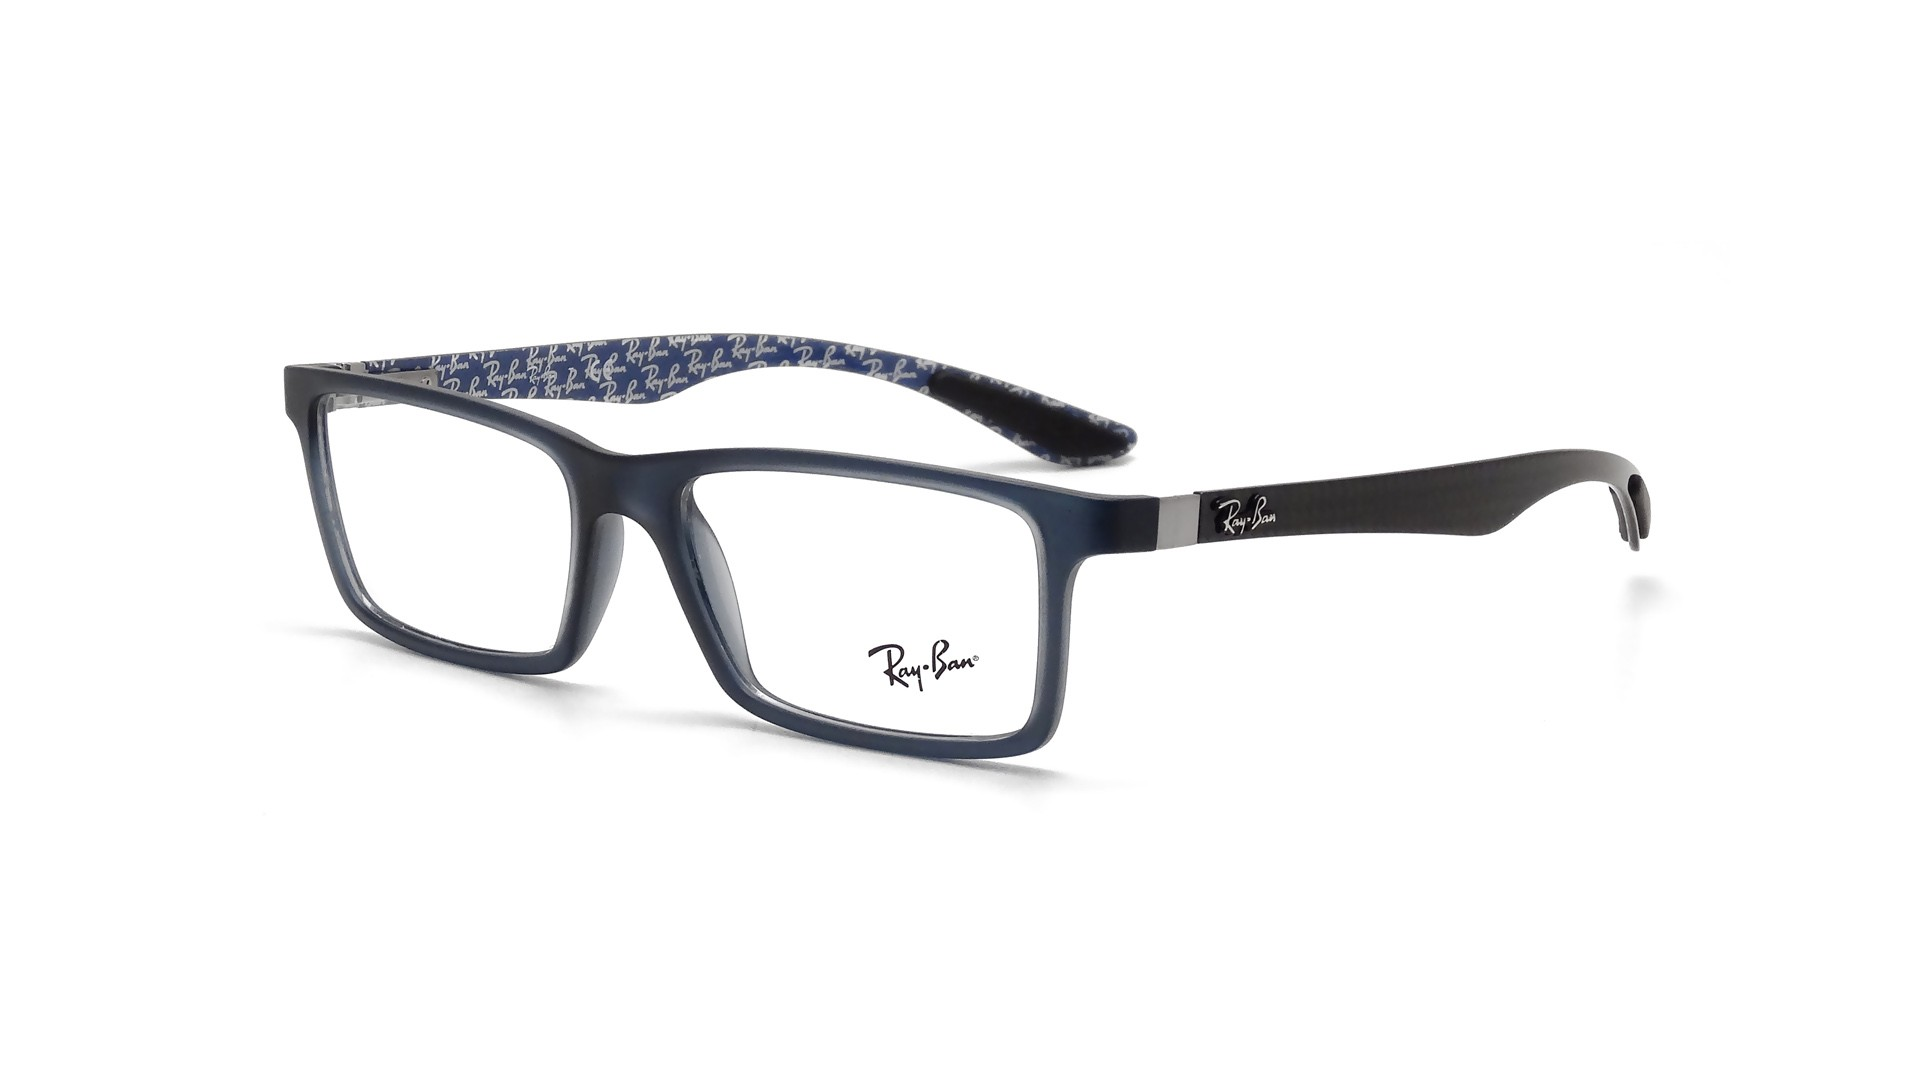 efa6cc9e30b Carbon Fibre Ray Ban Optical Eyewear « Heritage Malta